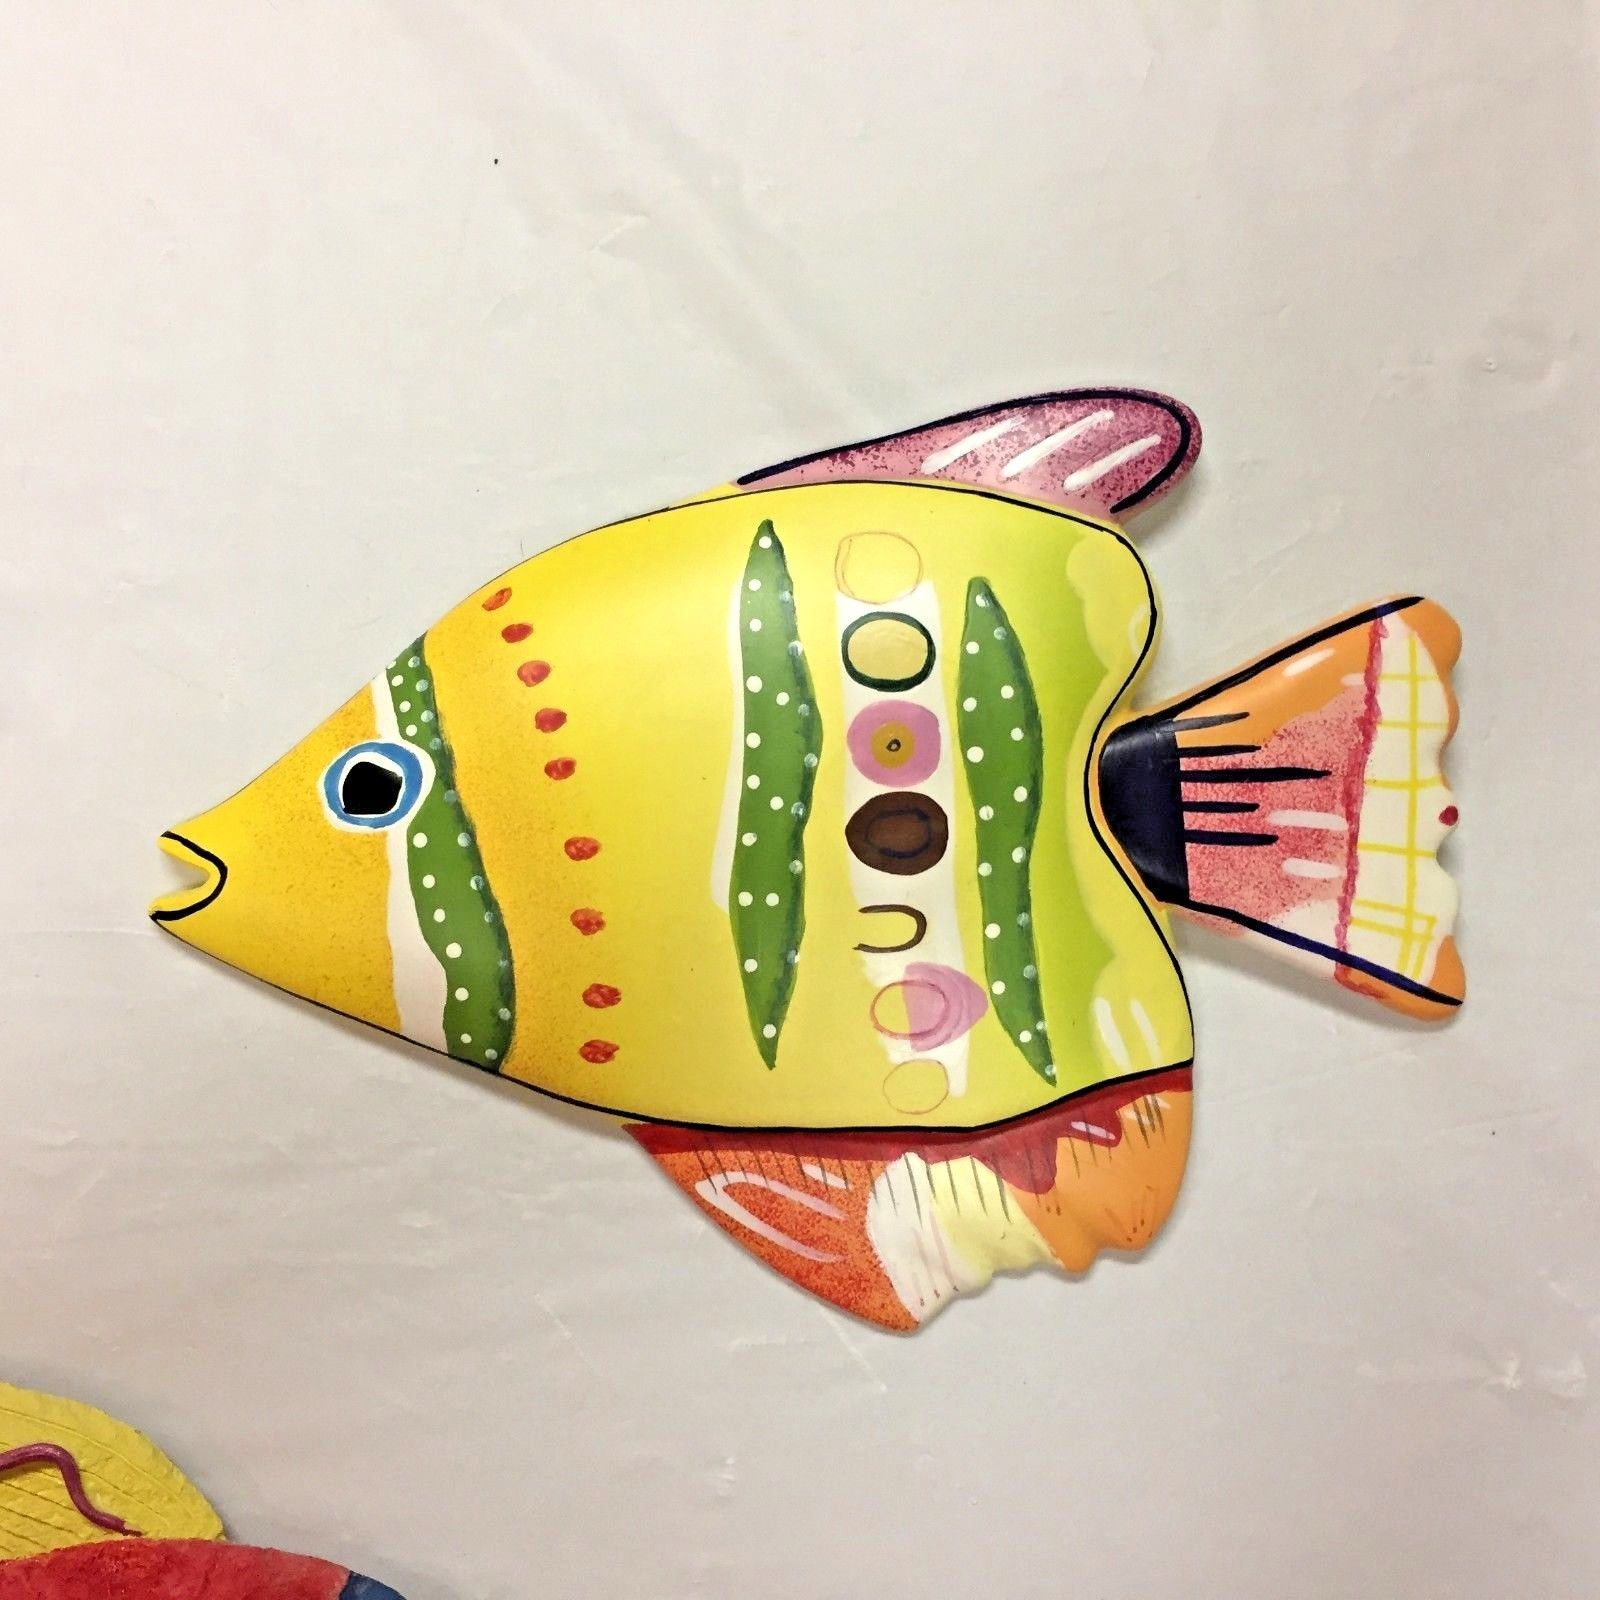 3 Whimsical Fish (1) Lori Siebert Wall ART and 49 similar items